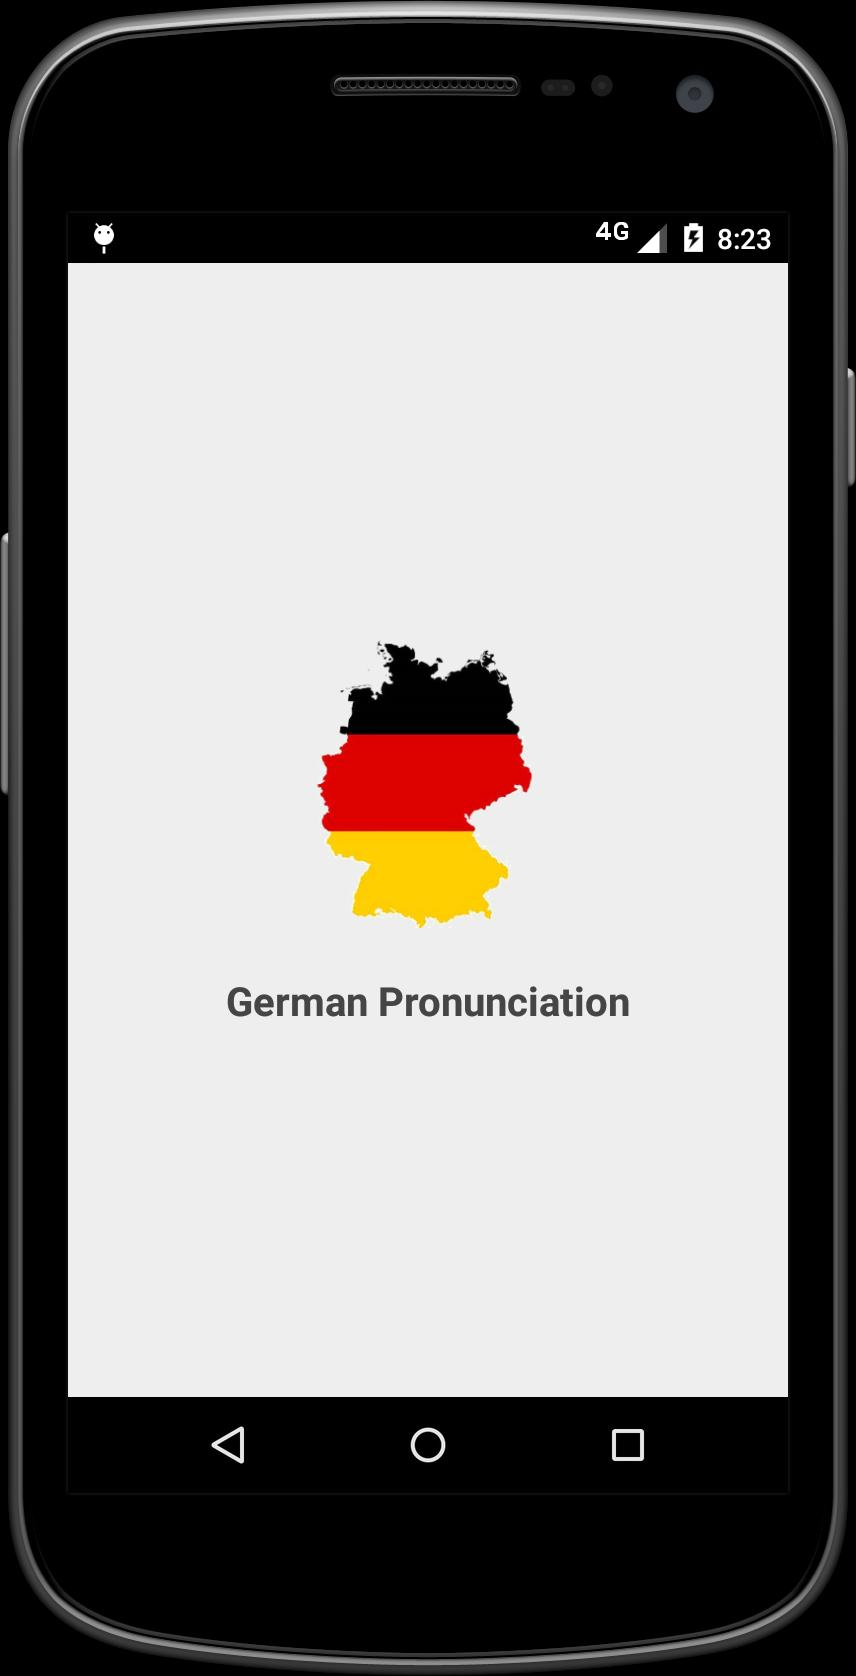 German Pronunciation for Android - APK Download